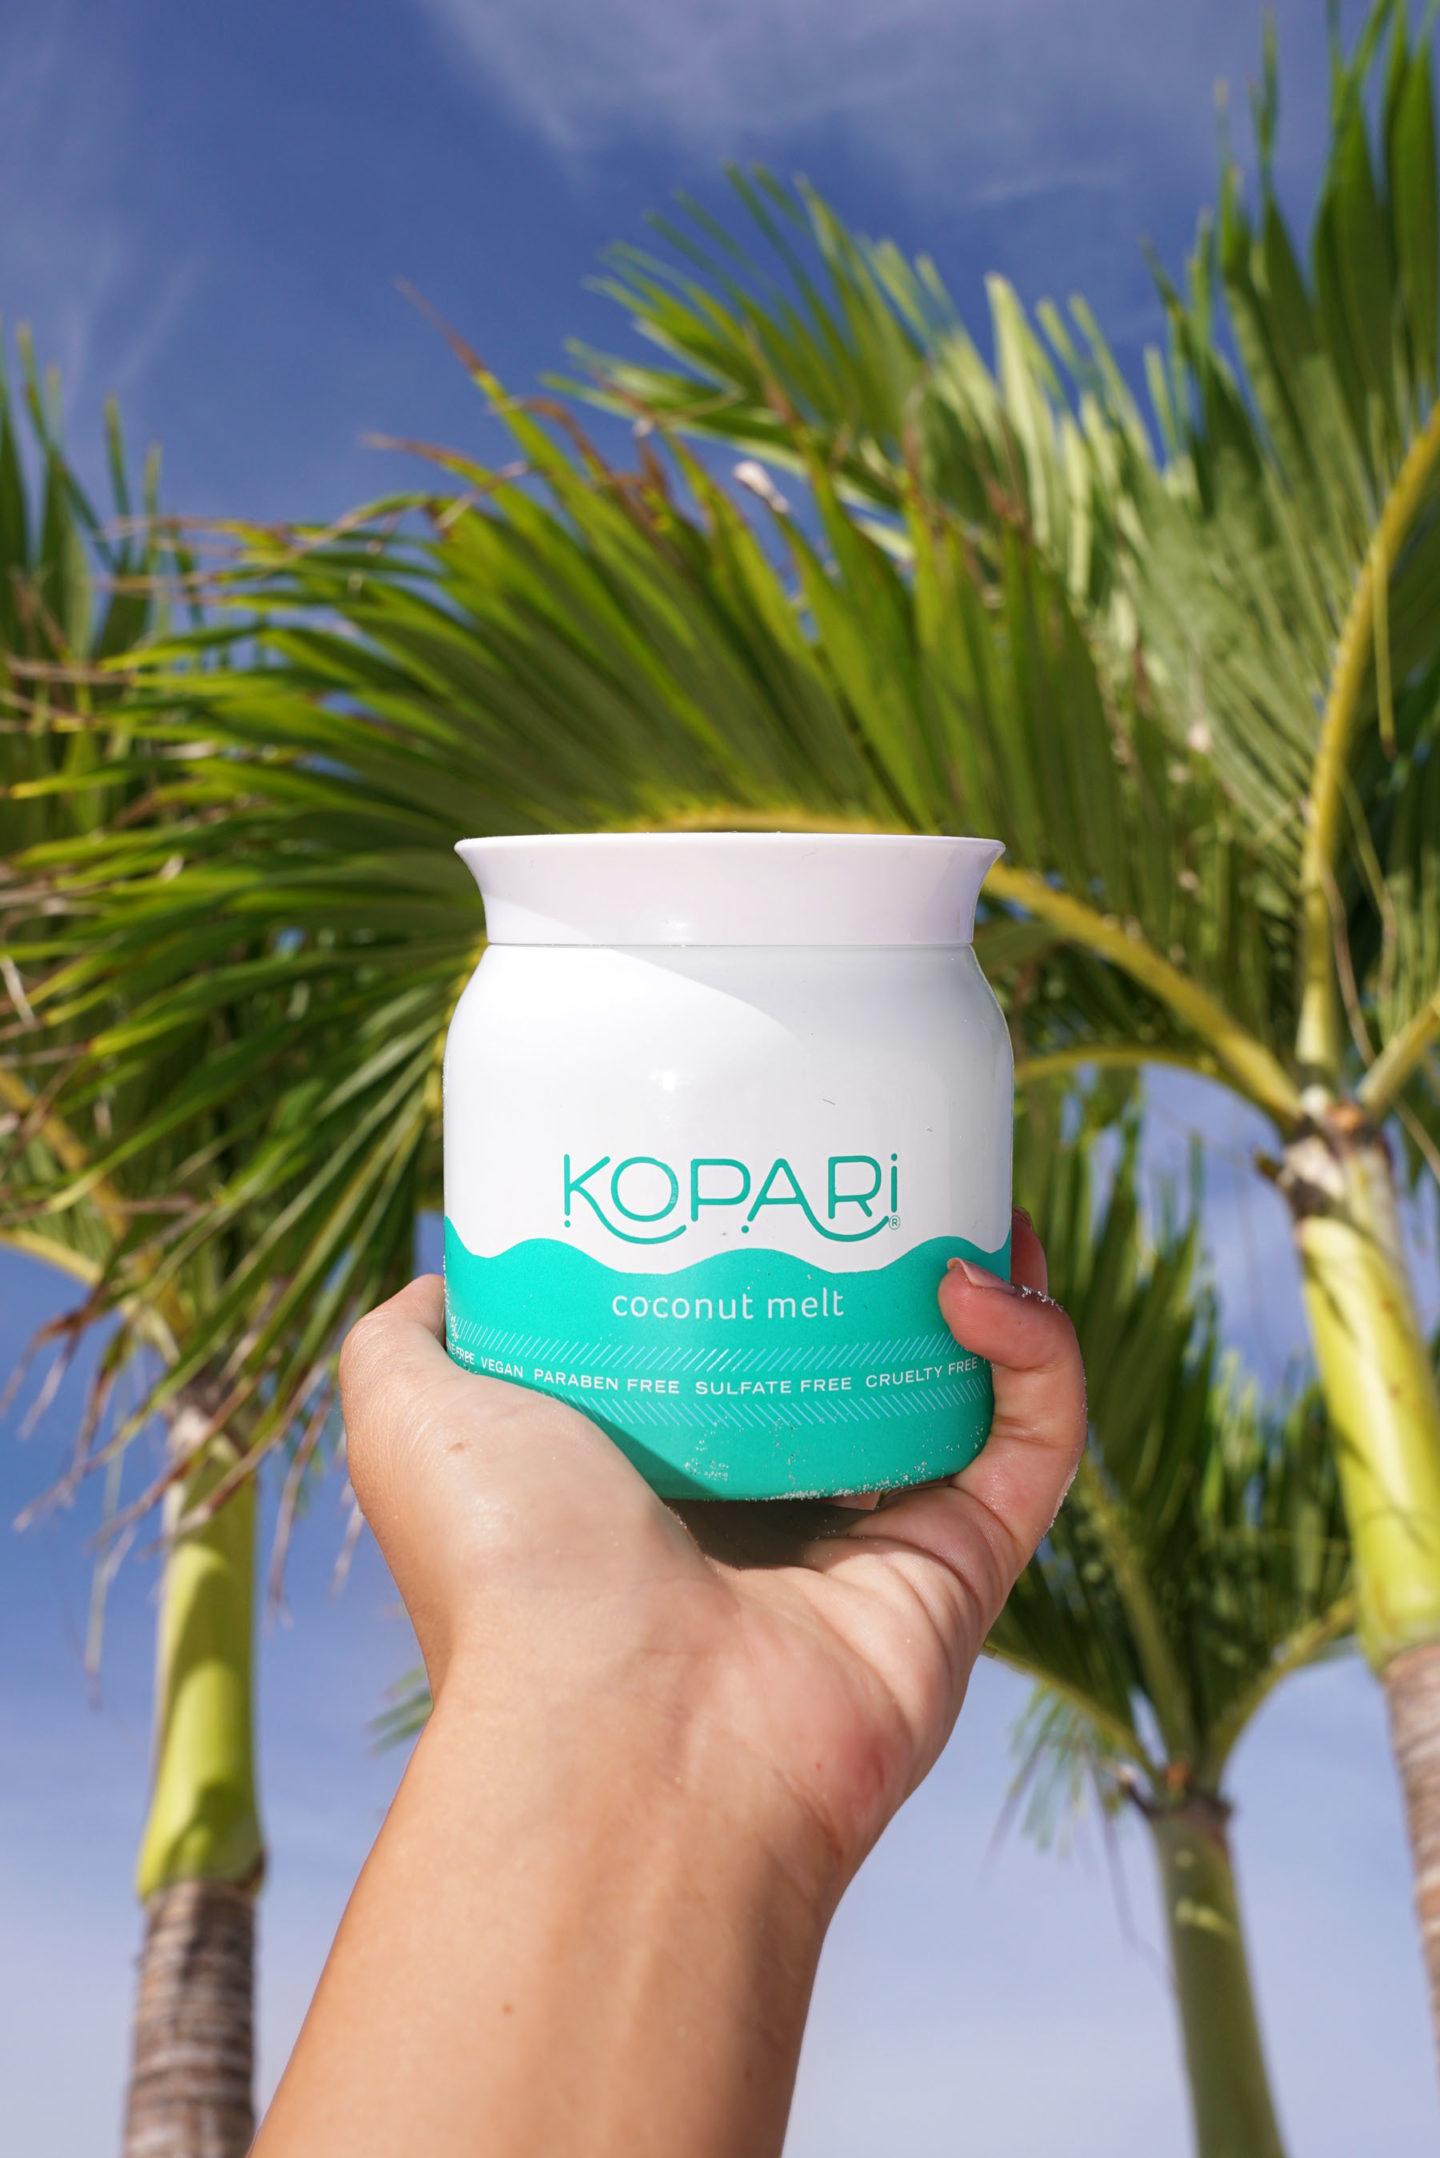 Kopari Coconut Melt Review   The Beauty Look Book